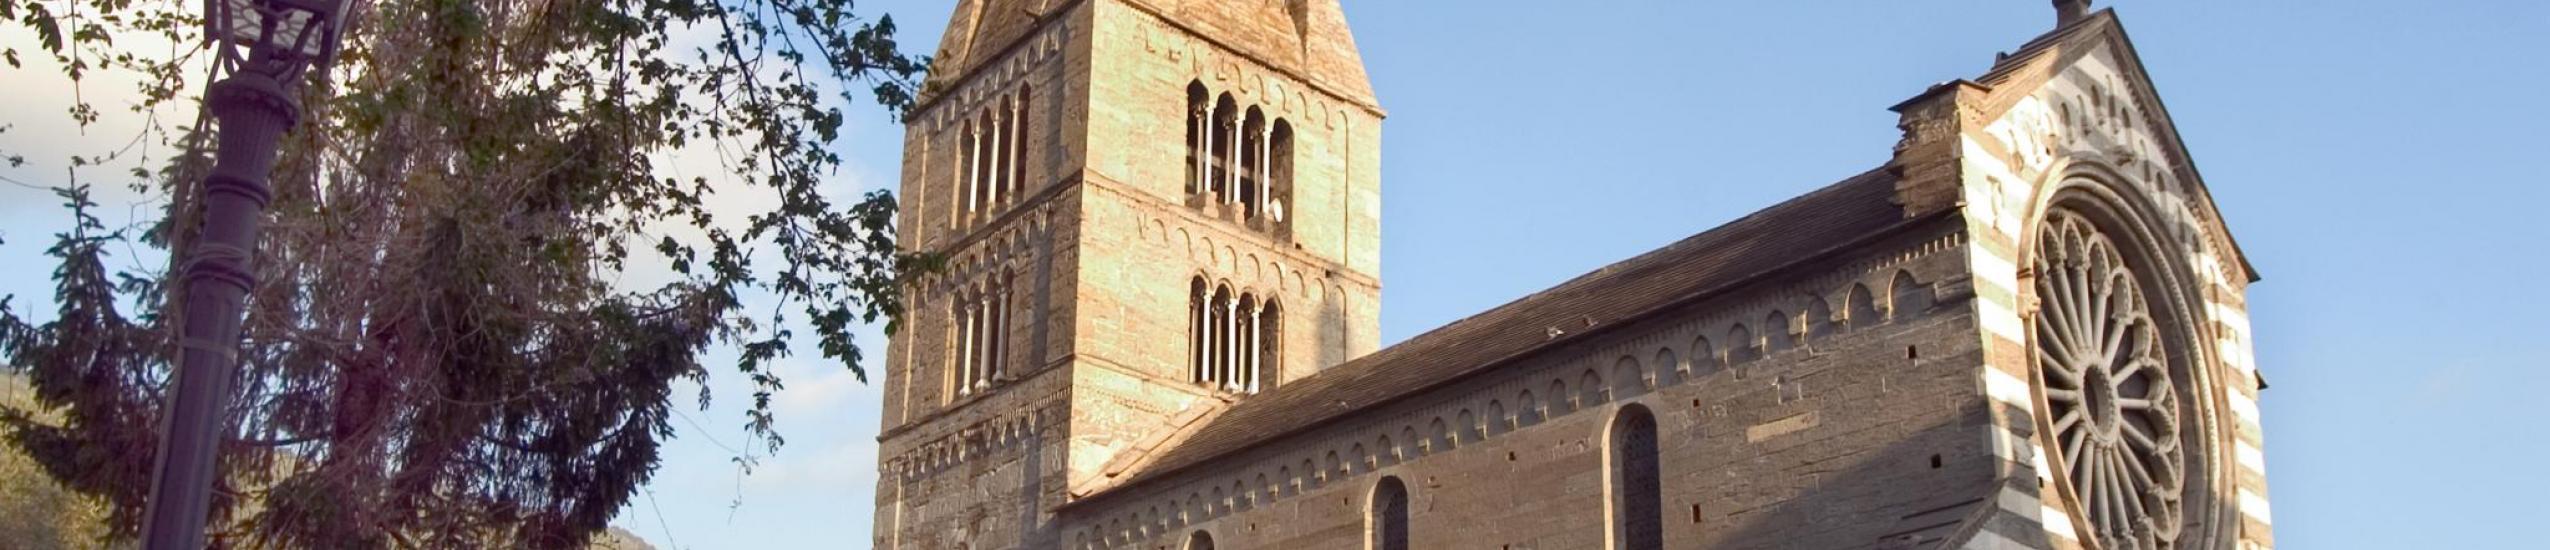 Complesso di san salvatore: Basilica dei Fieschi